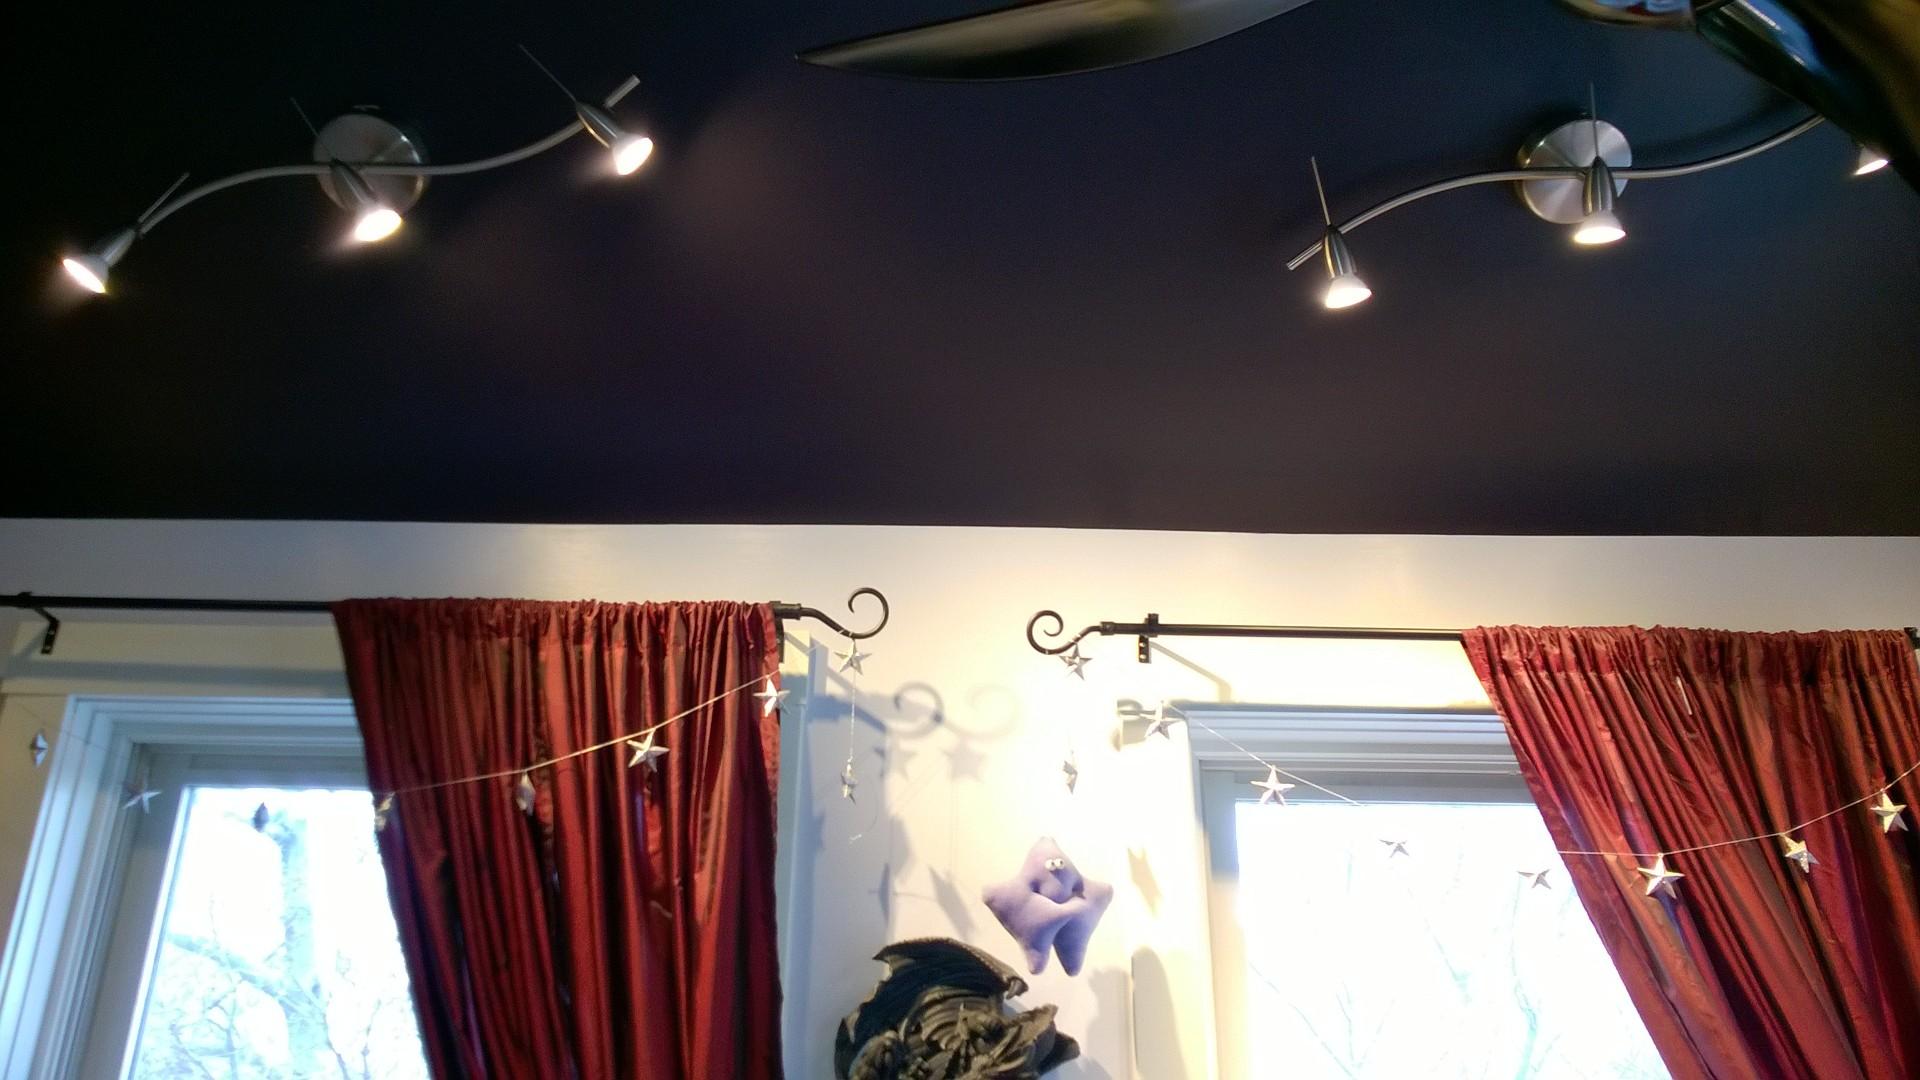 New lights for the girl cave orbited by nine dark moons i love my new lights aloadofball Gallery